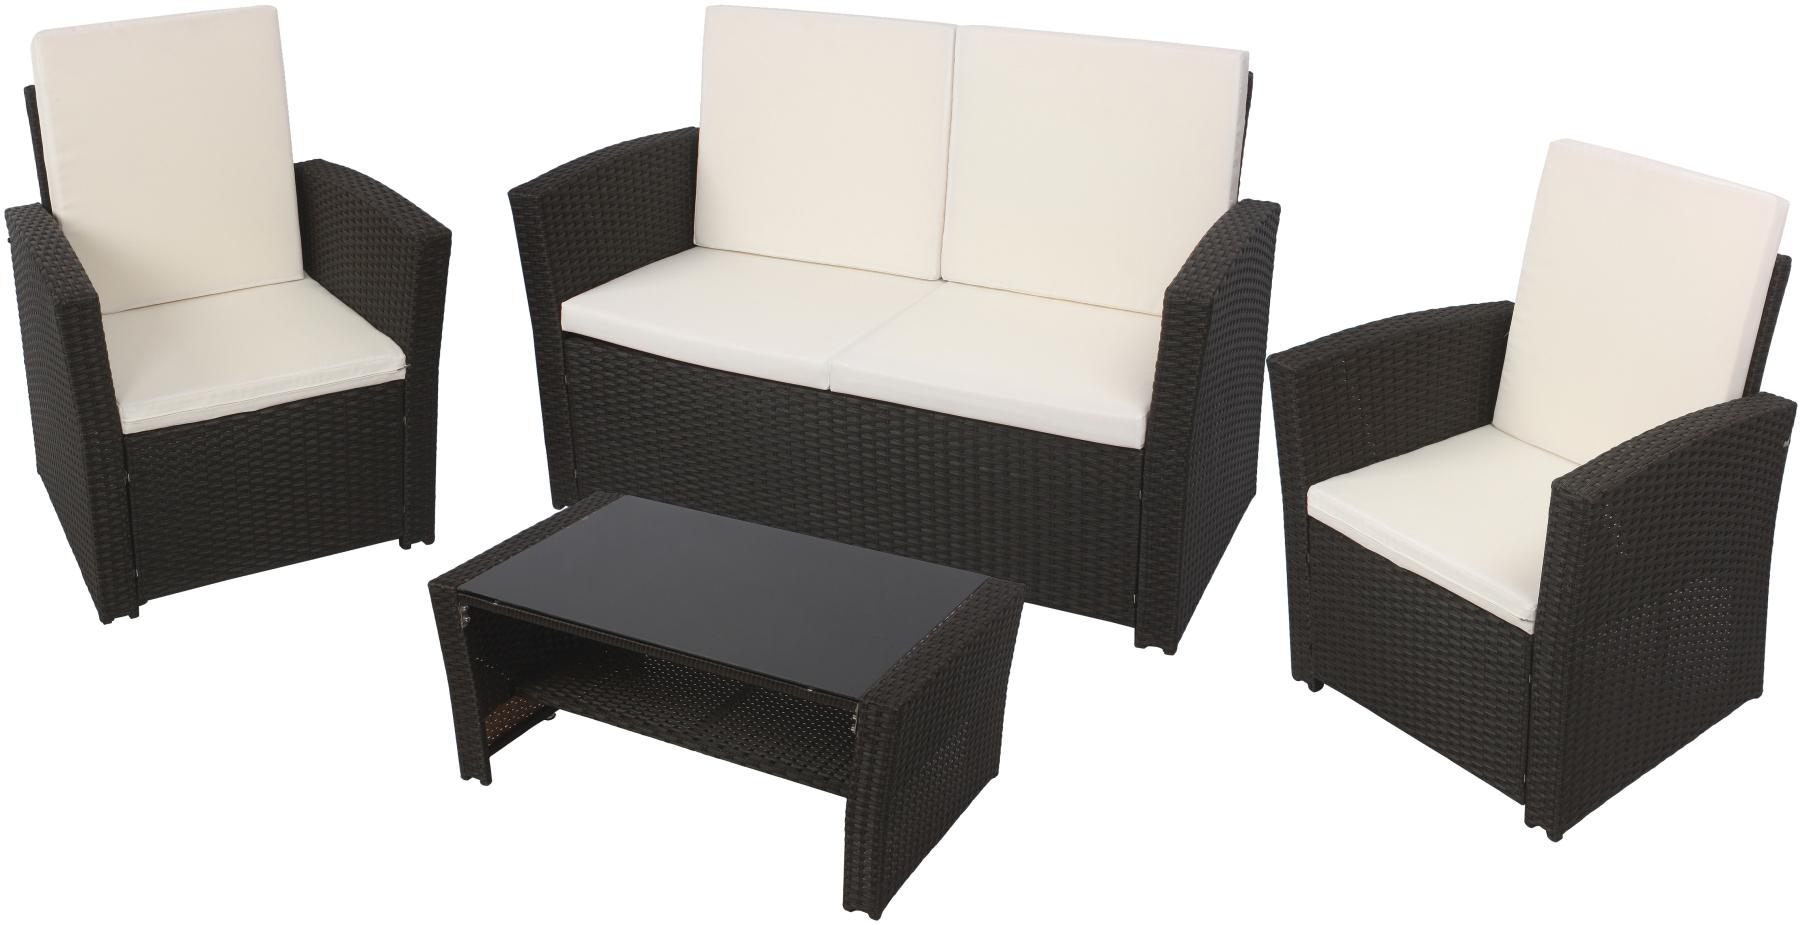 Rattan sitzgruppe lounge sessel sofa sitzgarnitur gartenmöbel